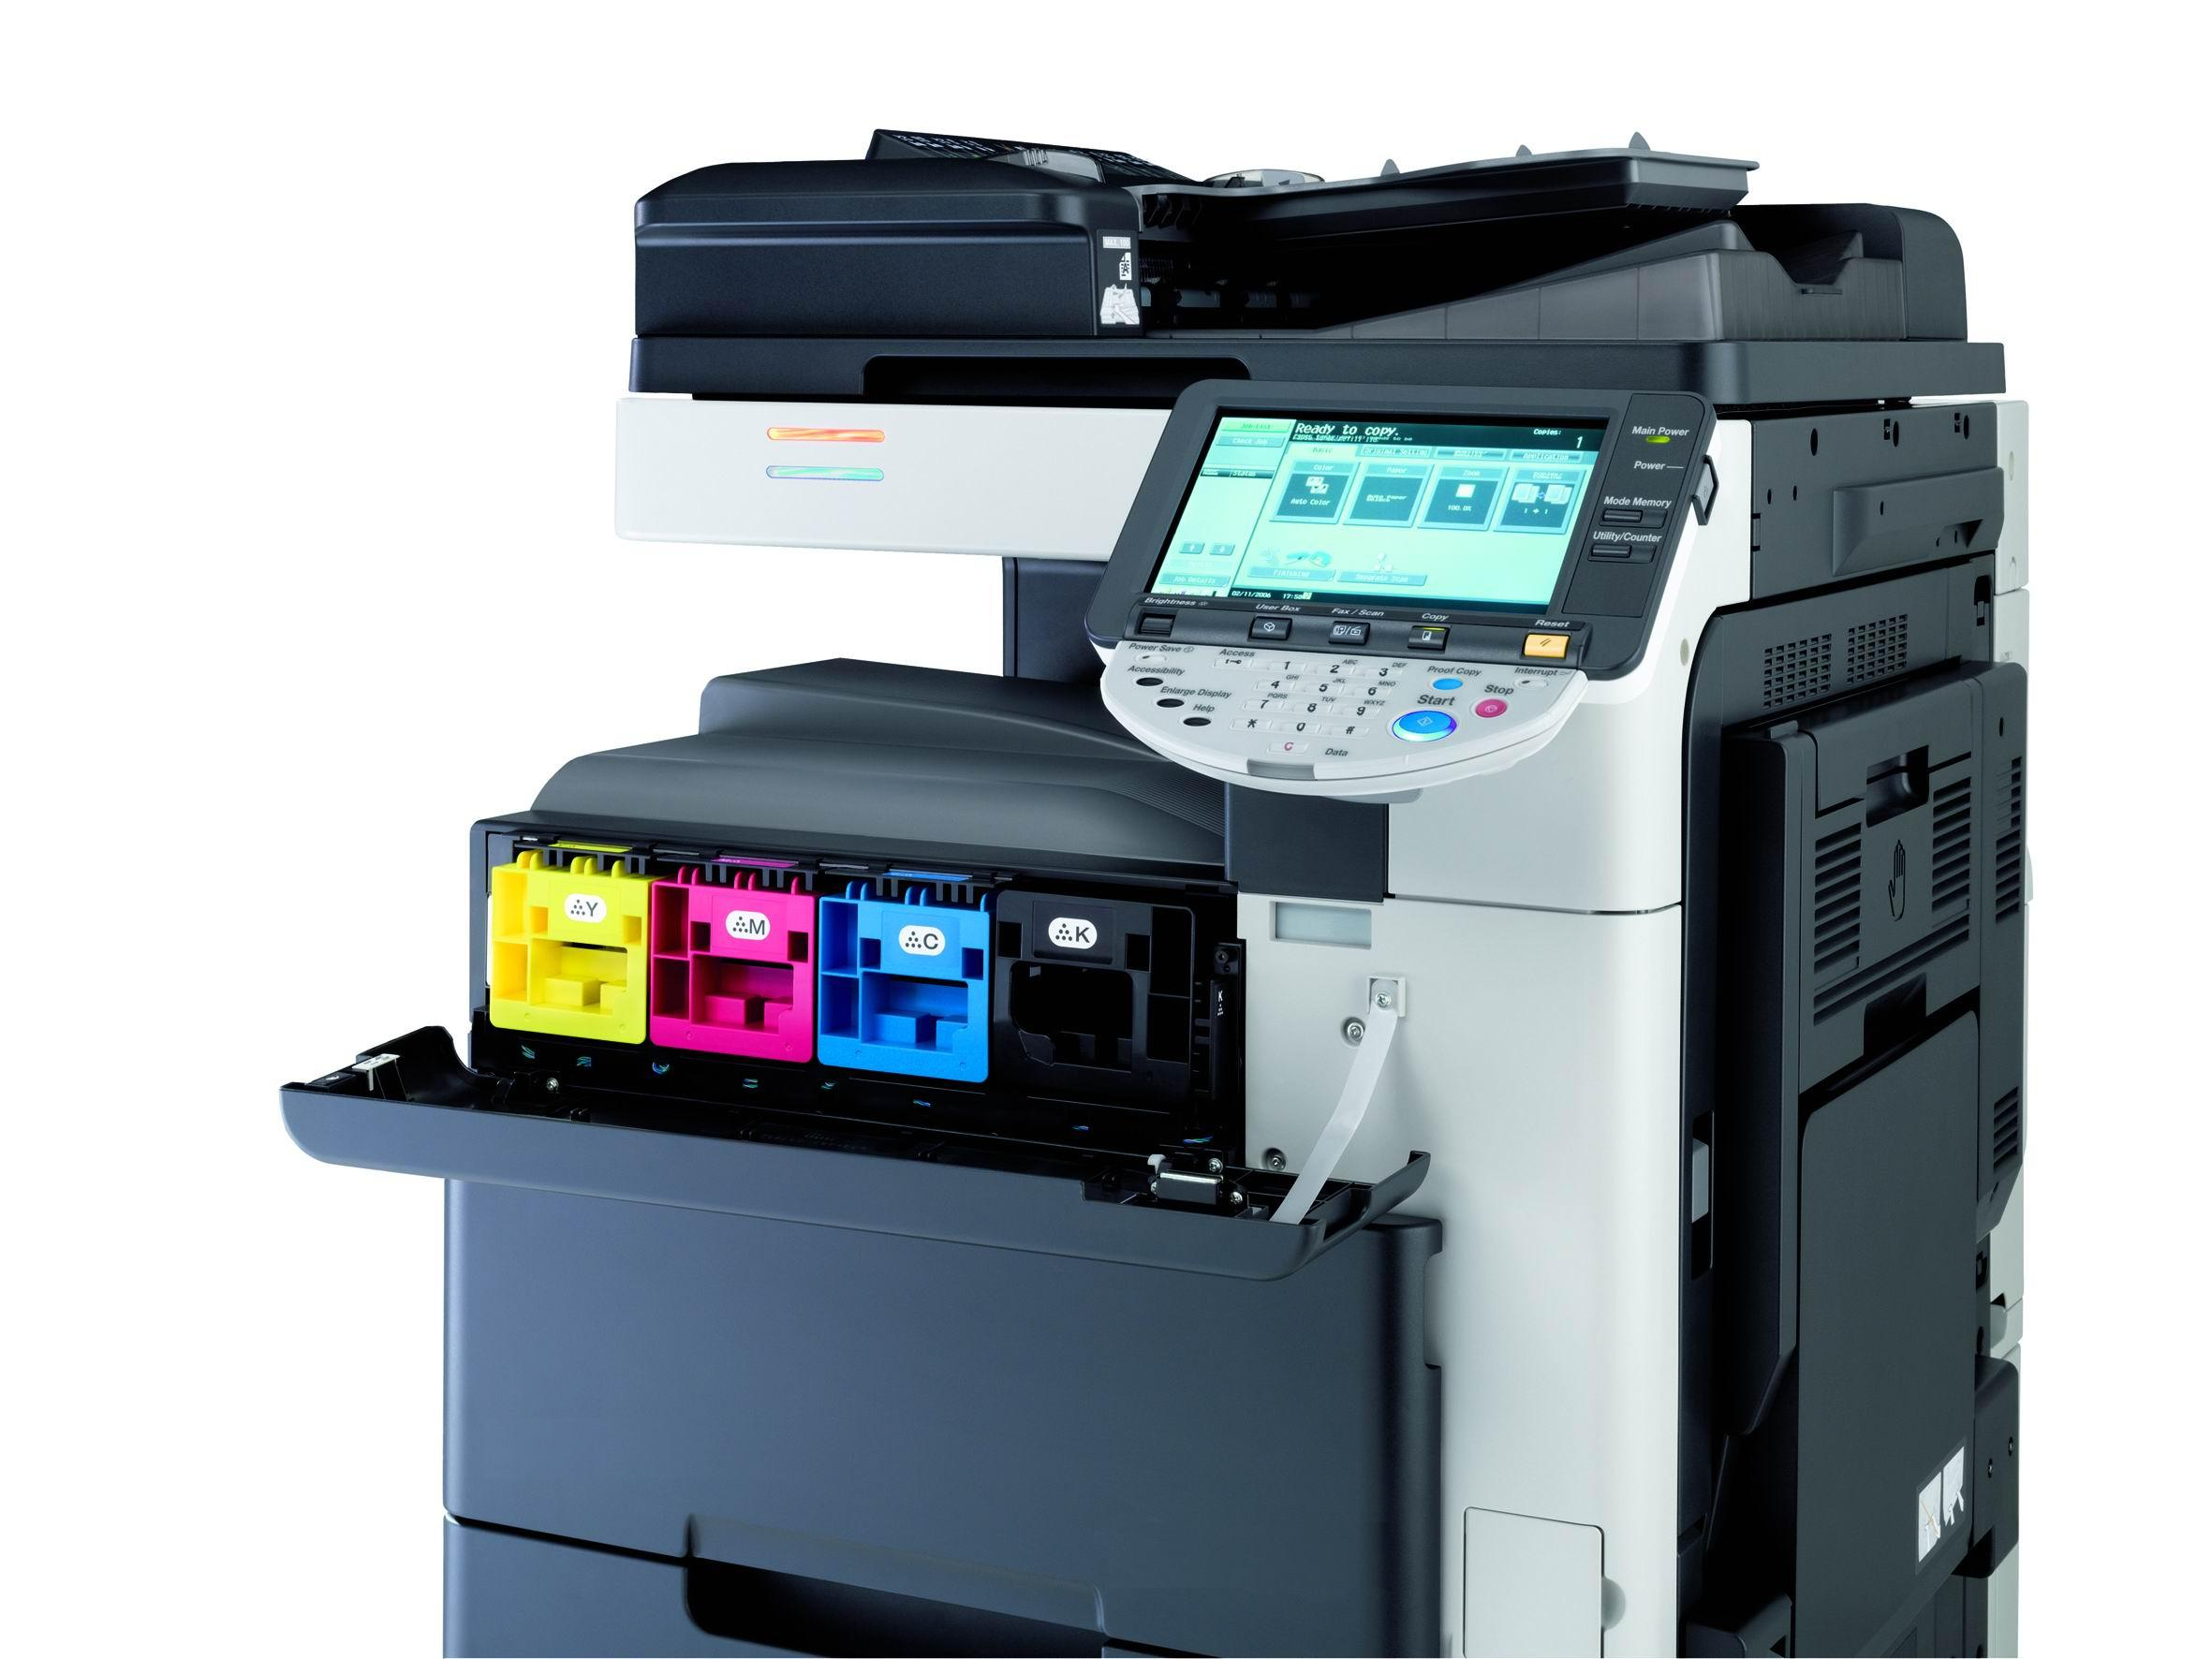 Fotocopiadoras KONICA MINOLTA – RICOH – KYOCERA – Impresoras – Mantenimiento especializado